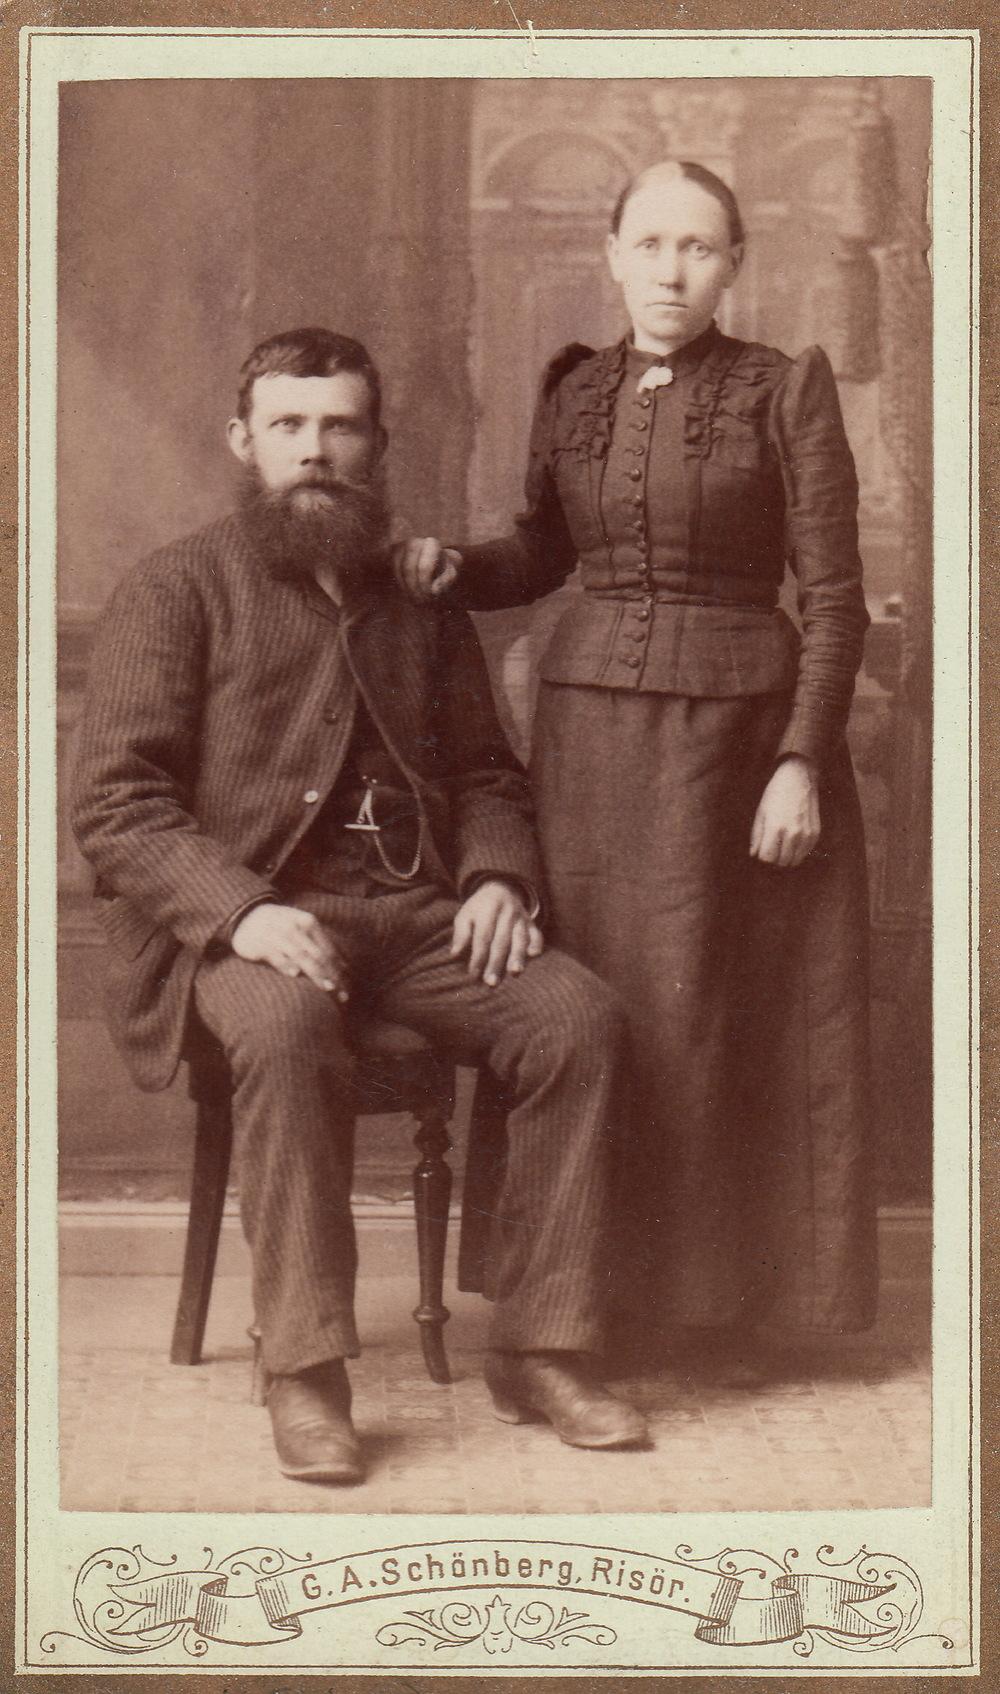 Anders og Maren Melås Lia - Emigrerte til USA i 1893.